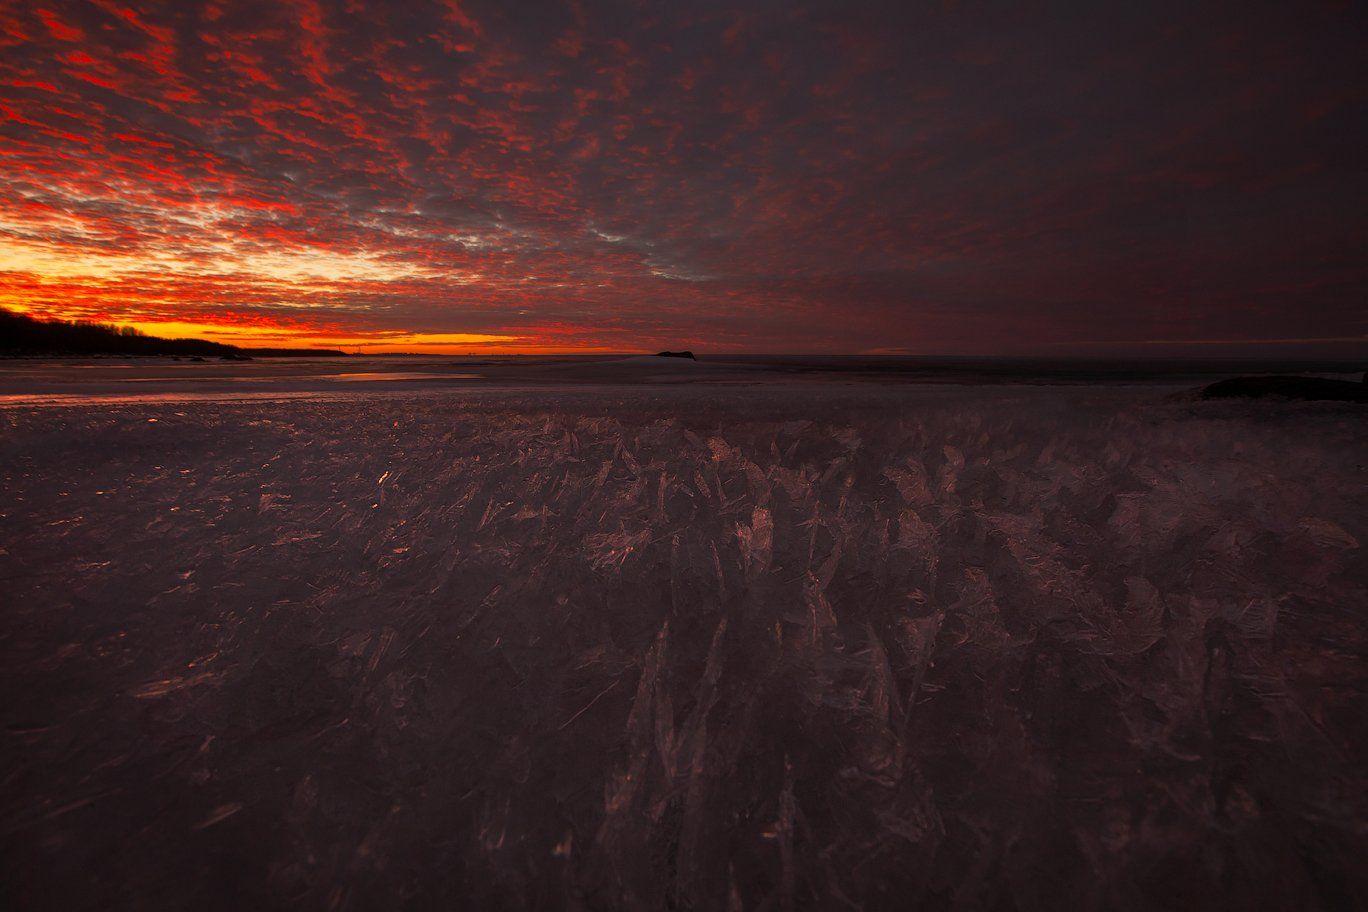 sunset, Aleksandr Kljuchenkow